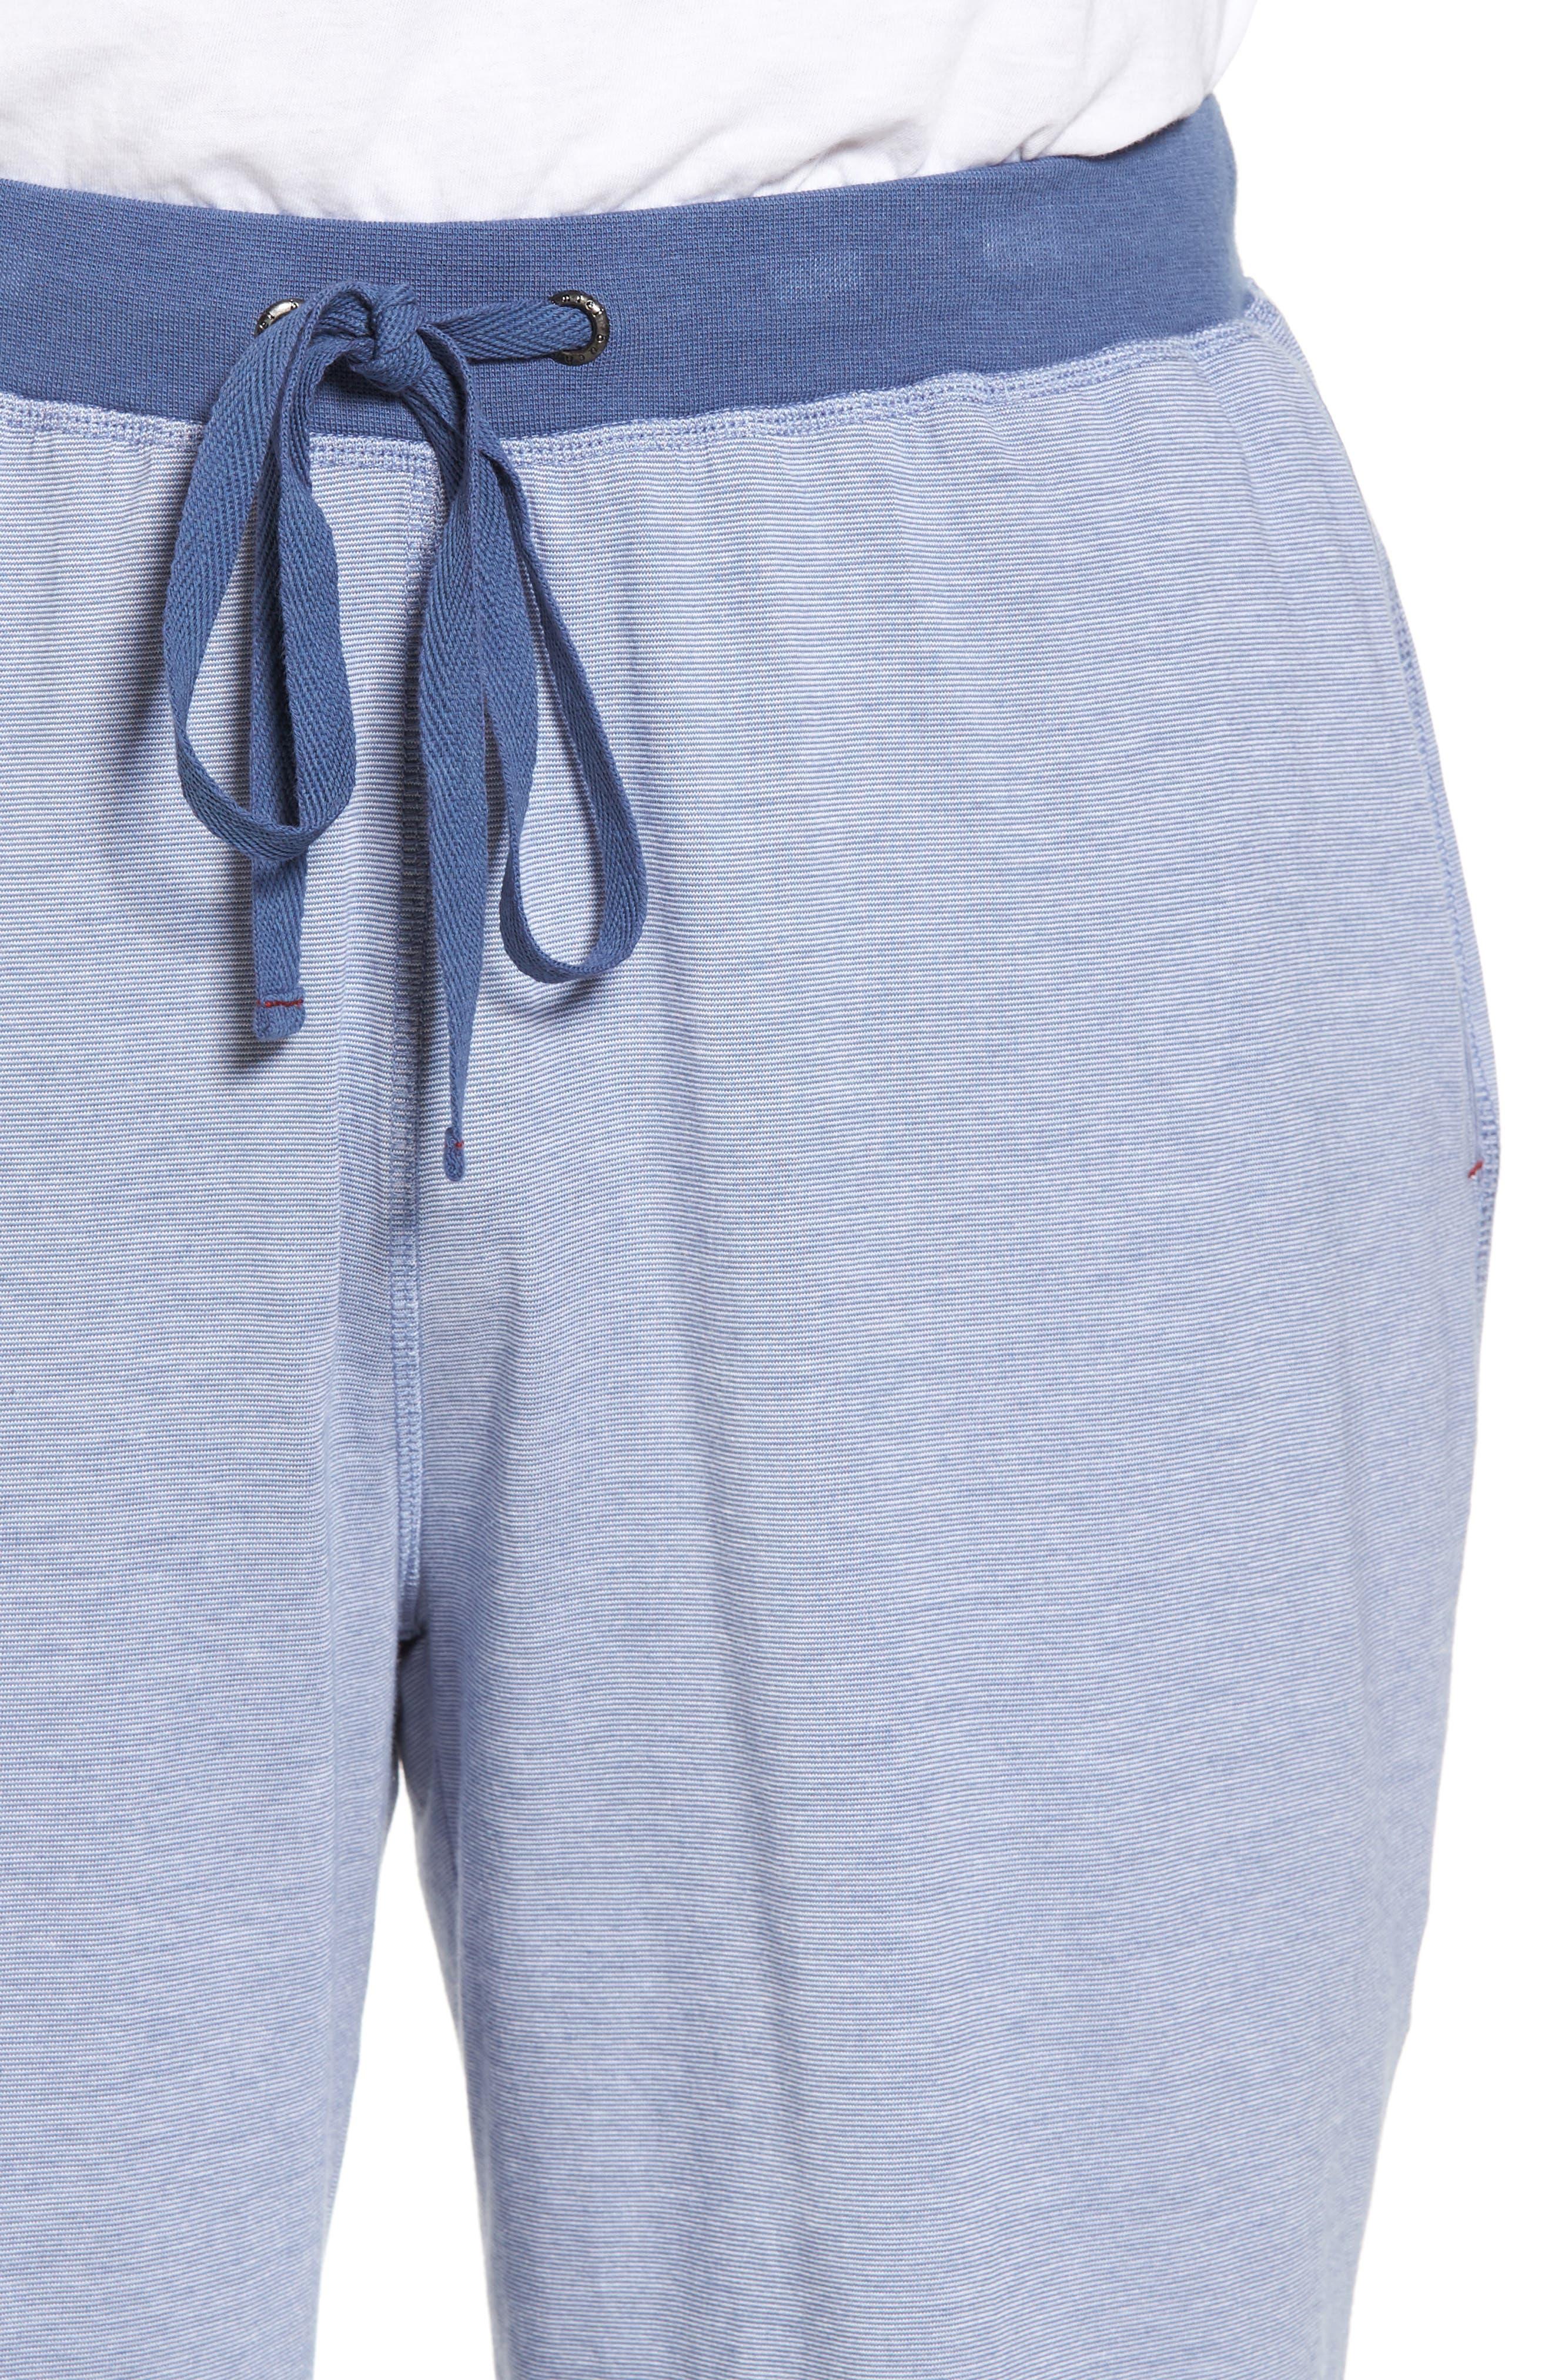 Pima Cotton & Modal Lounge Shorts,                             Alternate thumbnail 8, color,